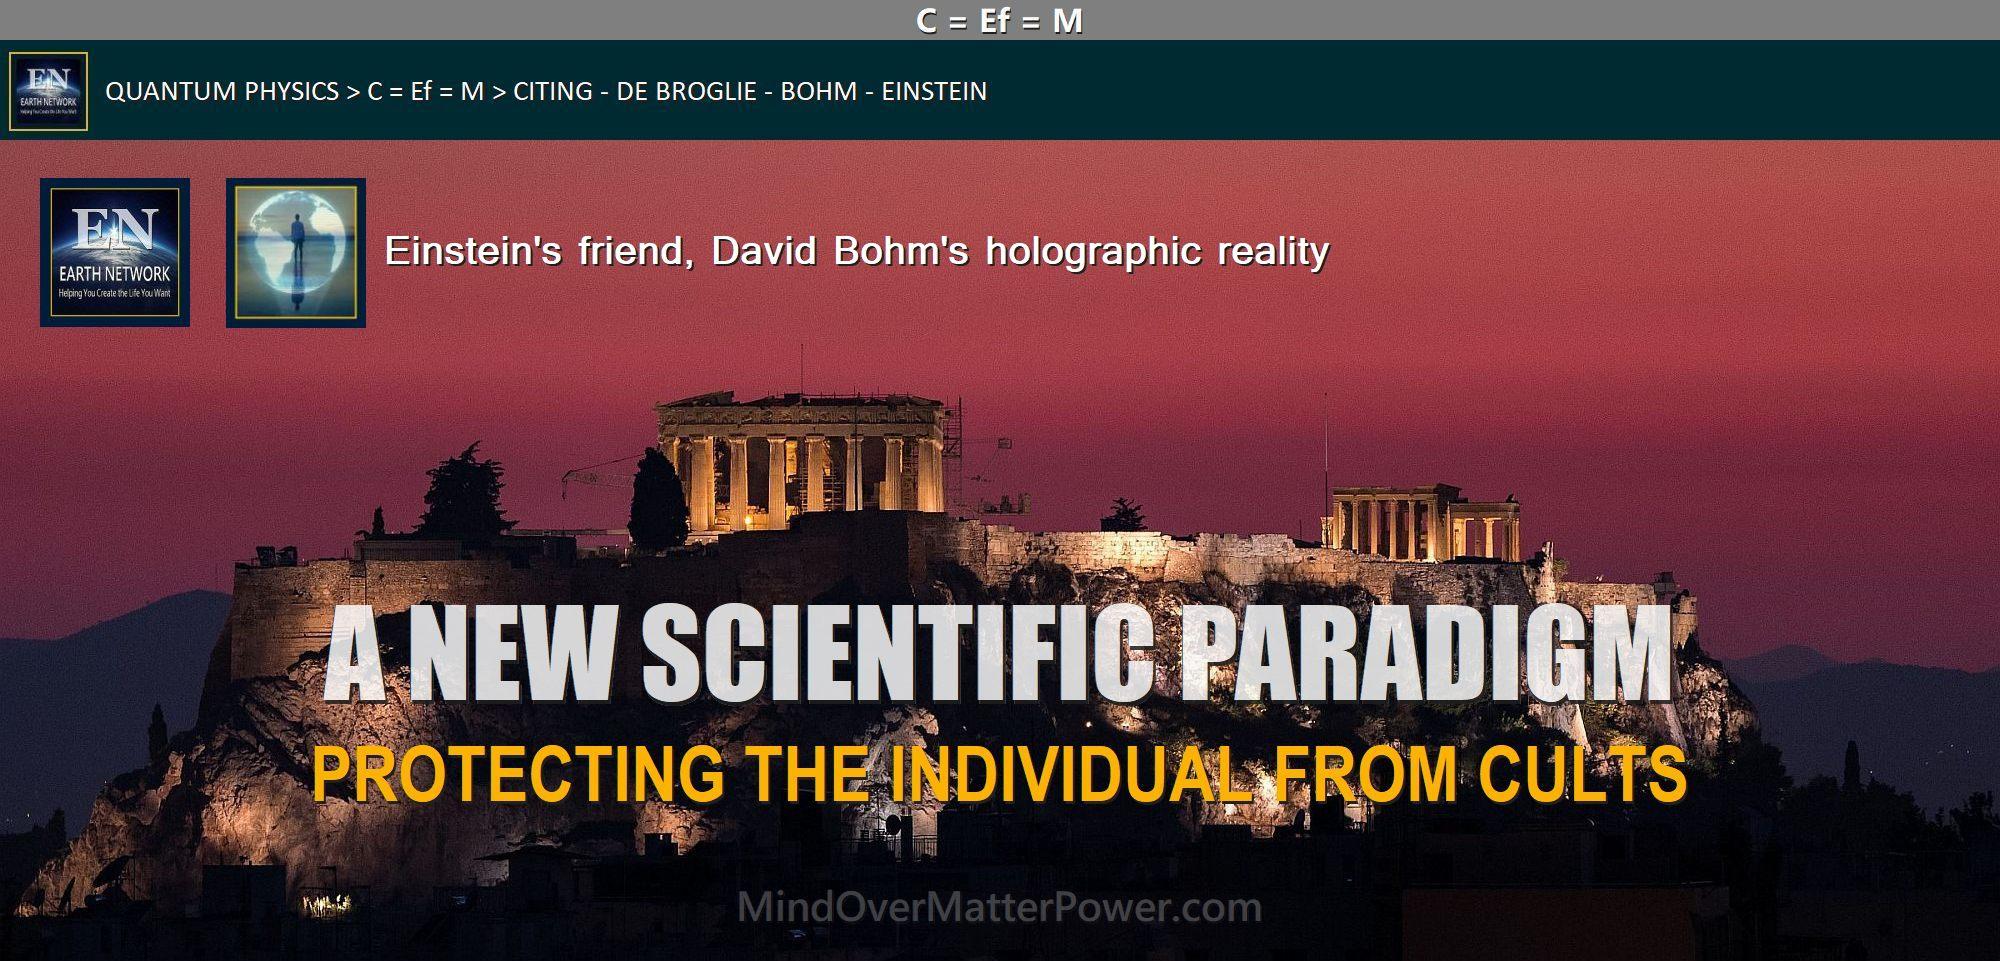 Greek-city-represents-metaphysics-quantum-physics-mechanics-new-age-paradigm-worldview-ideology-philosophy